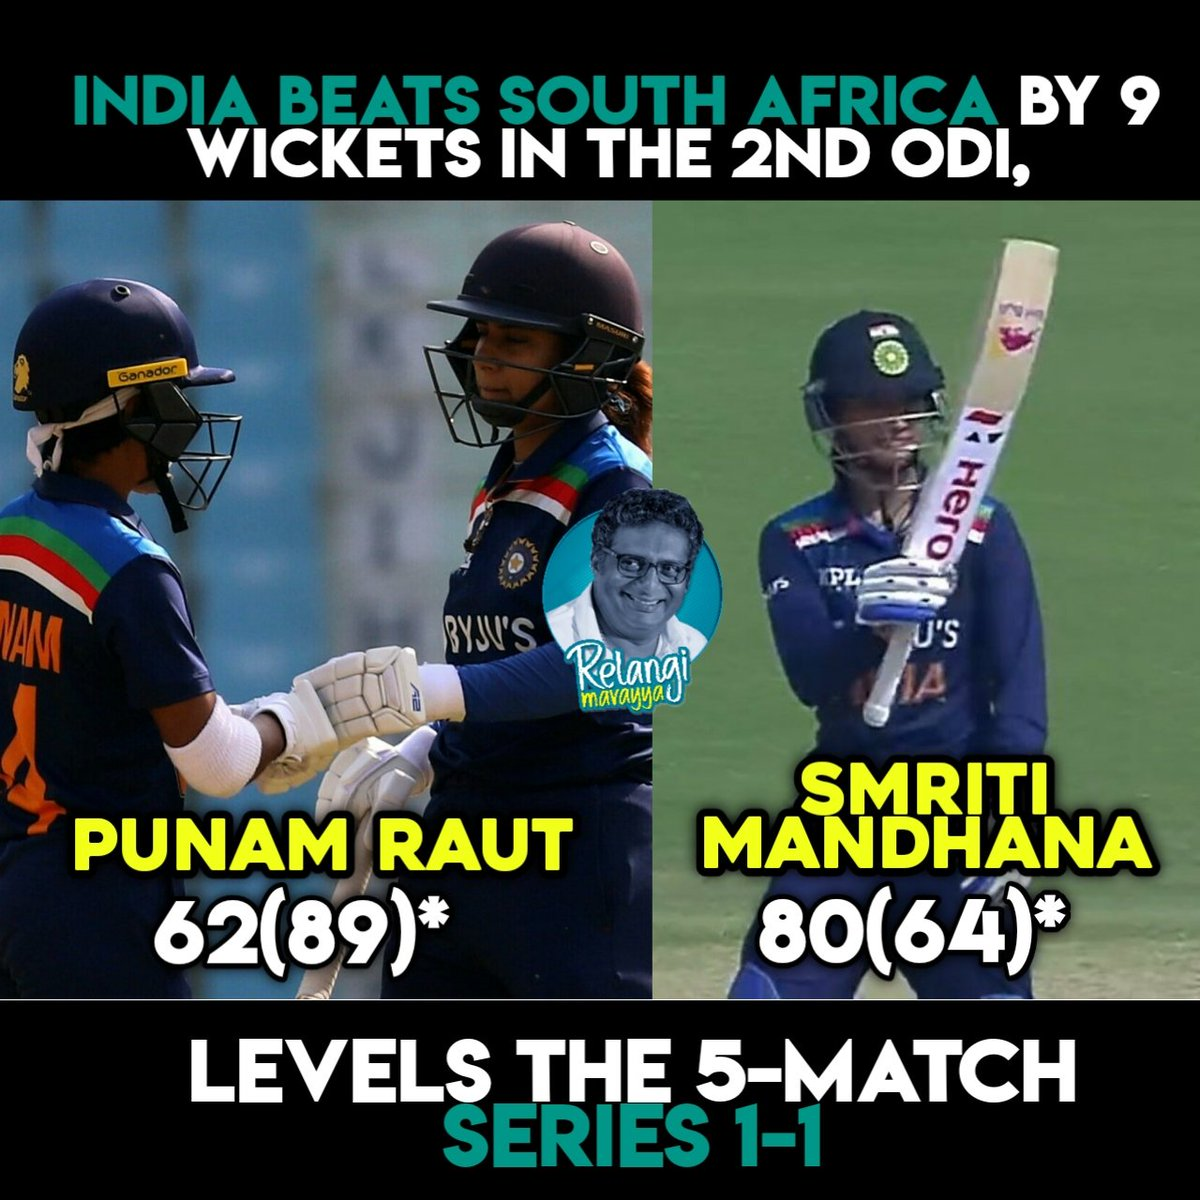 India beats South Africa by 9 wickets in the 2nd ODI, levels the 5-match series 1-1. #INDWvSAW #SmritiMandhana #JhulanGoswami #PunamRaut #RajeshwariGayakwad #Cricket  #Realngimavayya